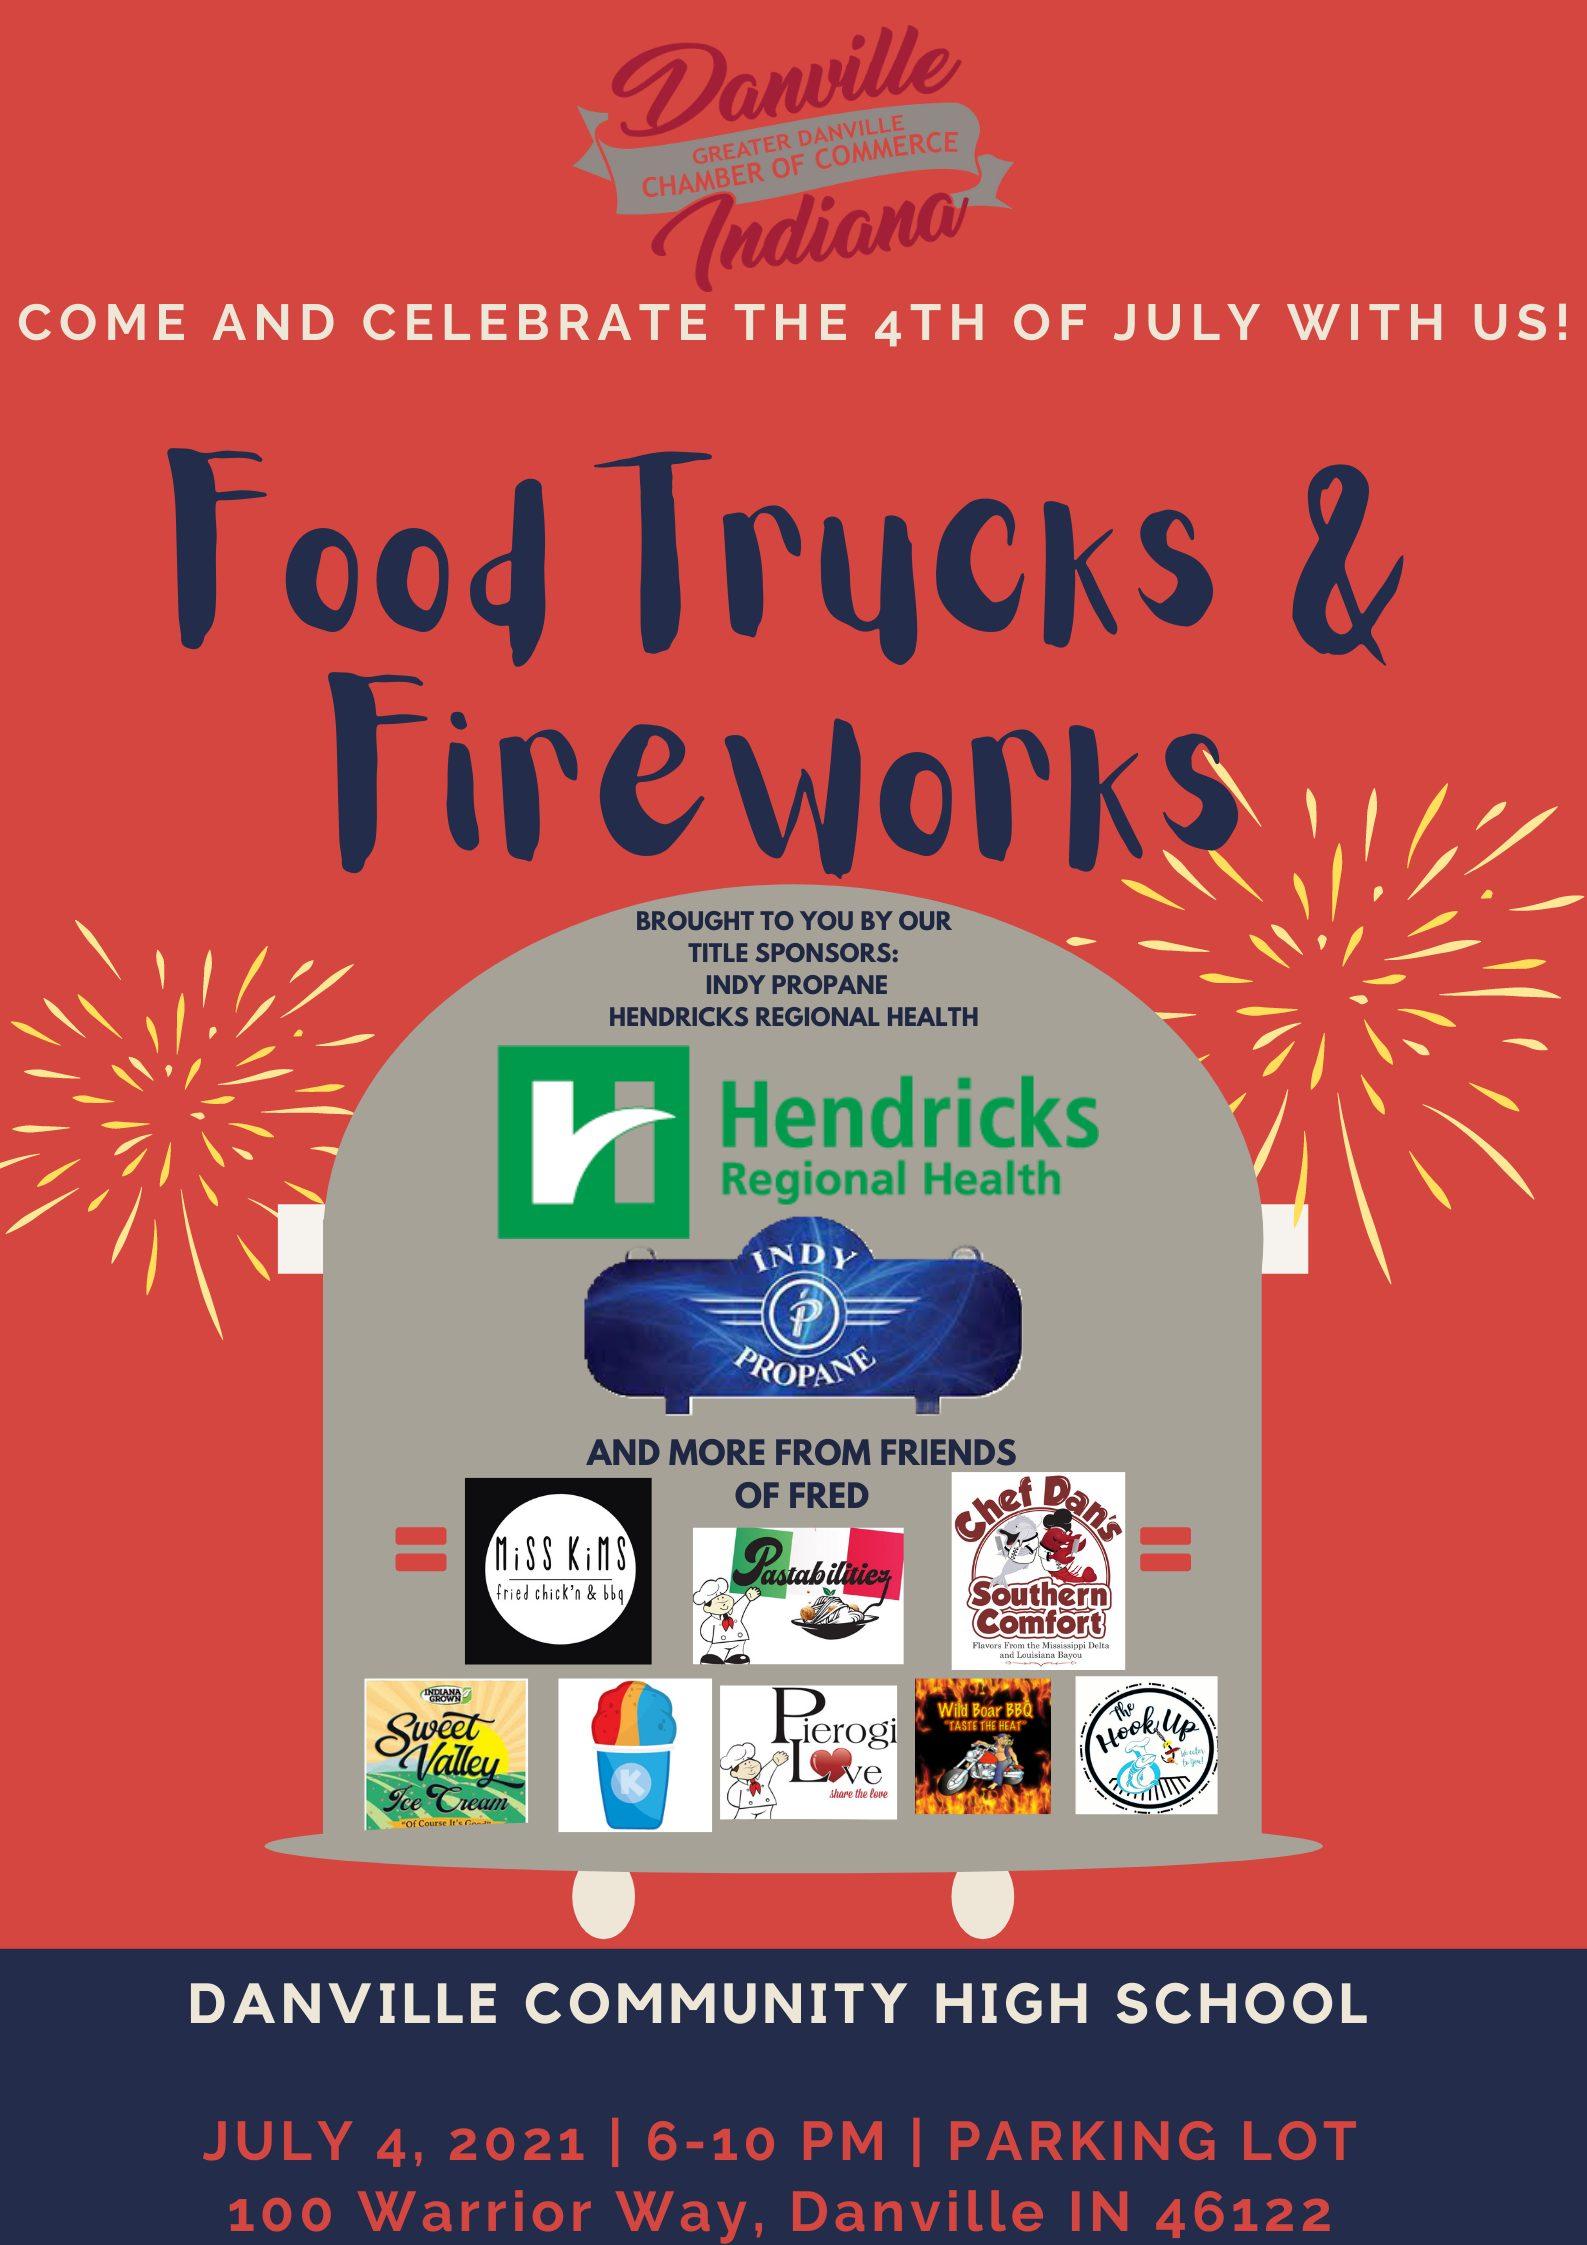 2021 Food Trucks and Fireworks flyer